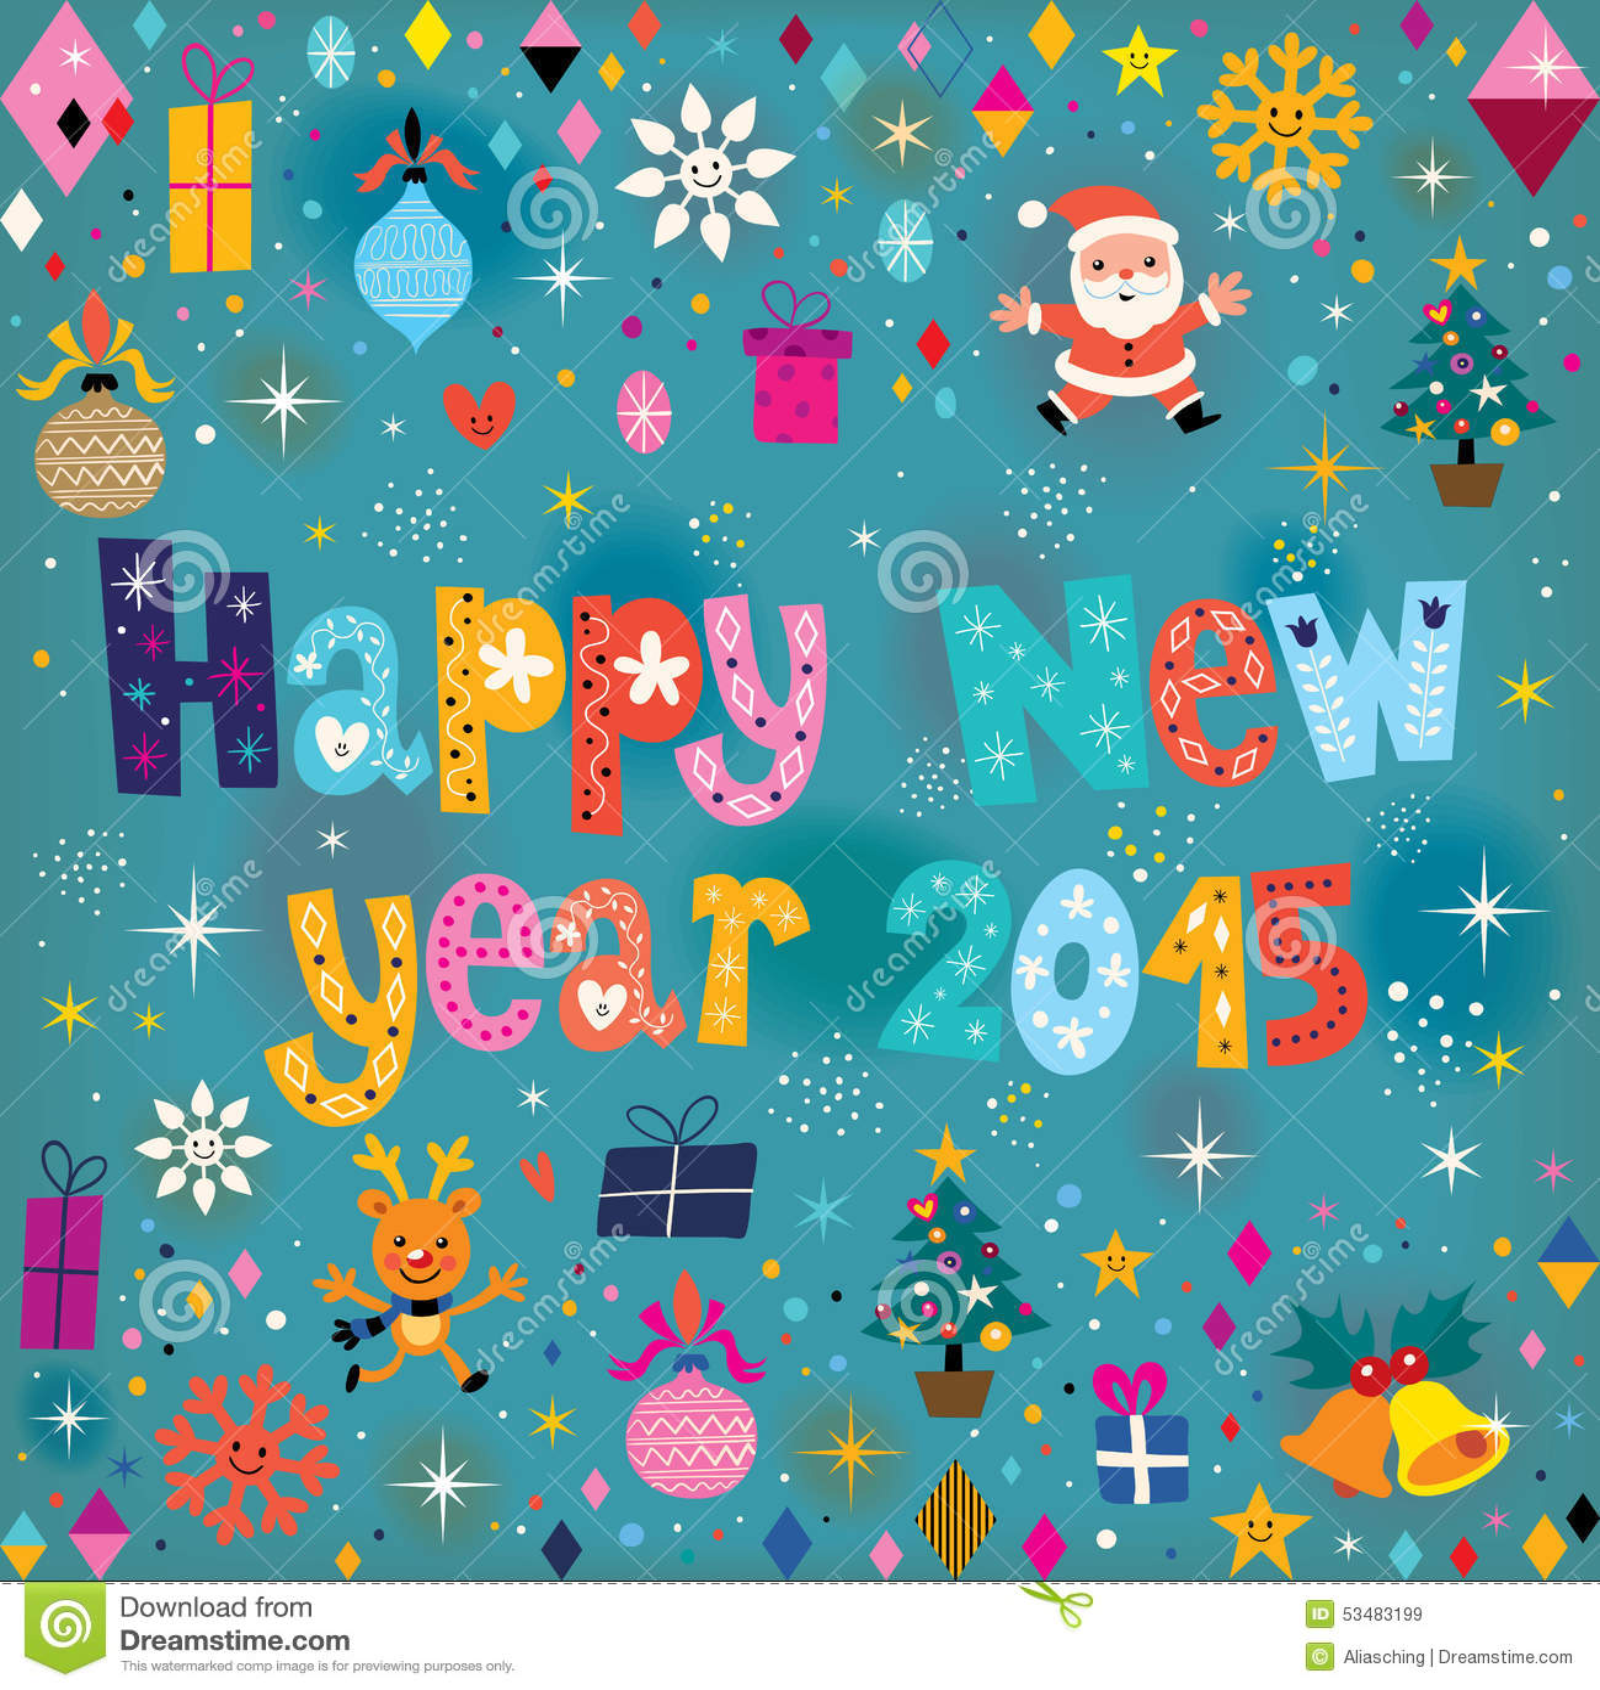 Happy New Year 2015 Retro Greeting Card Stock Vector Illustration